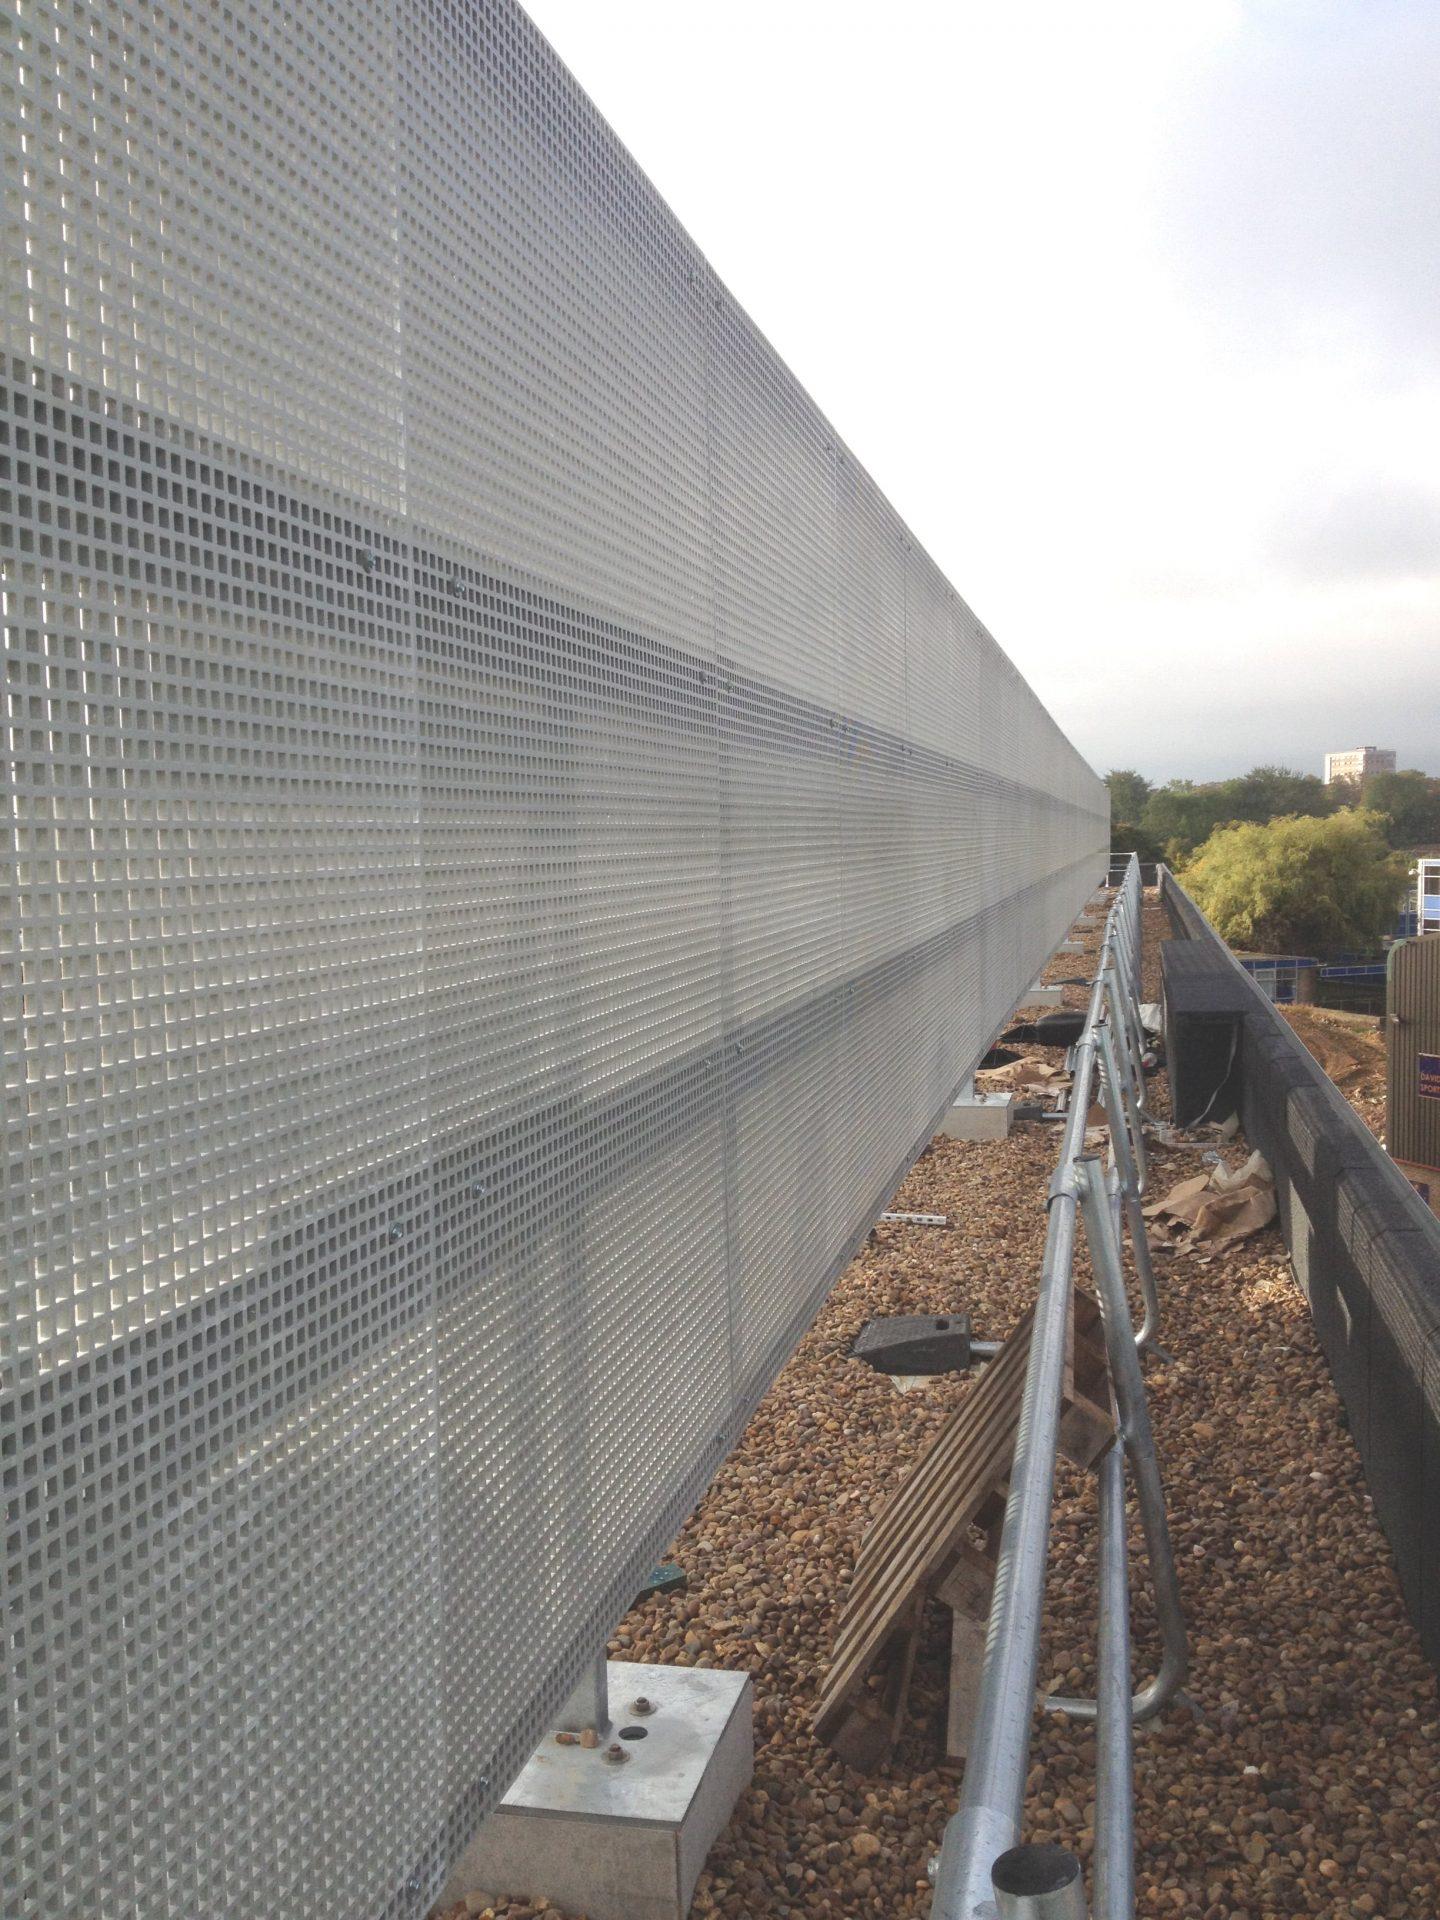 Fibreglass mesh air conditioning screening